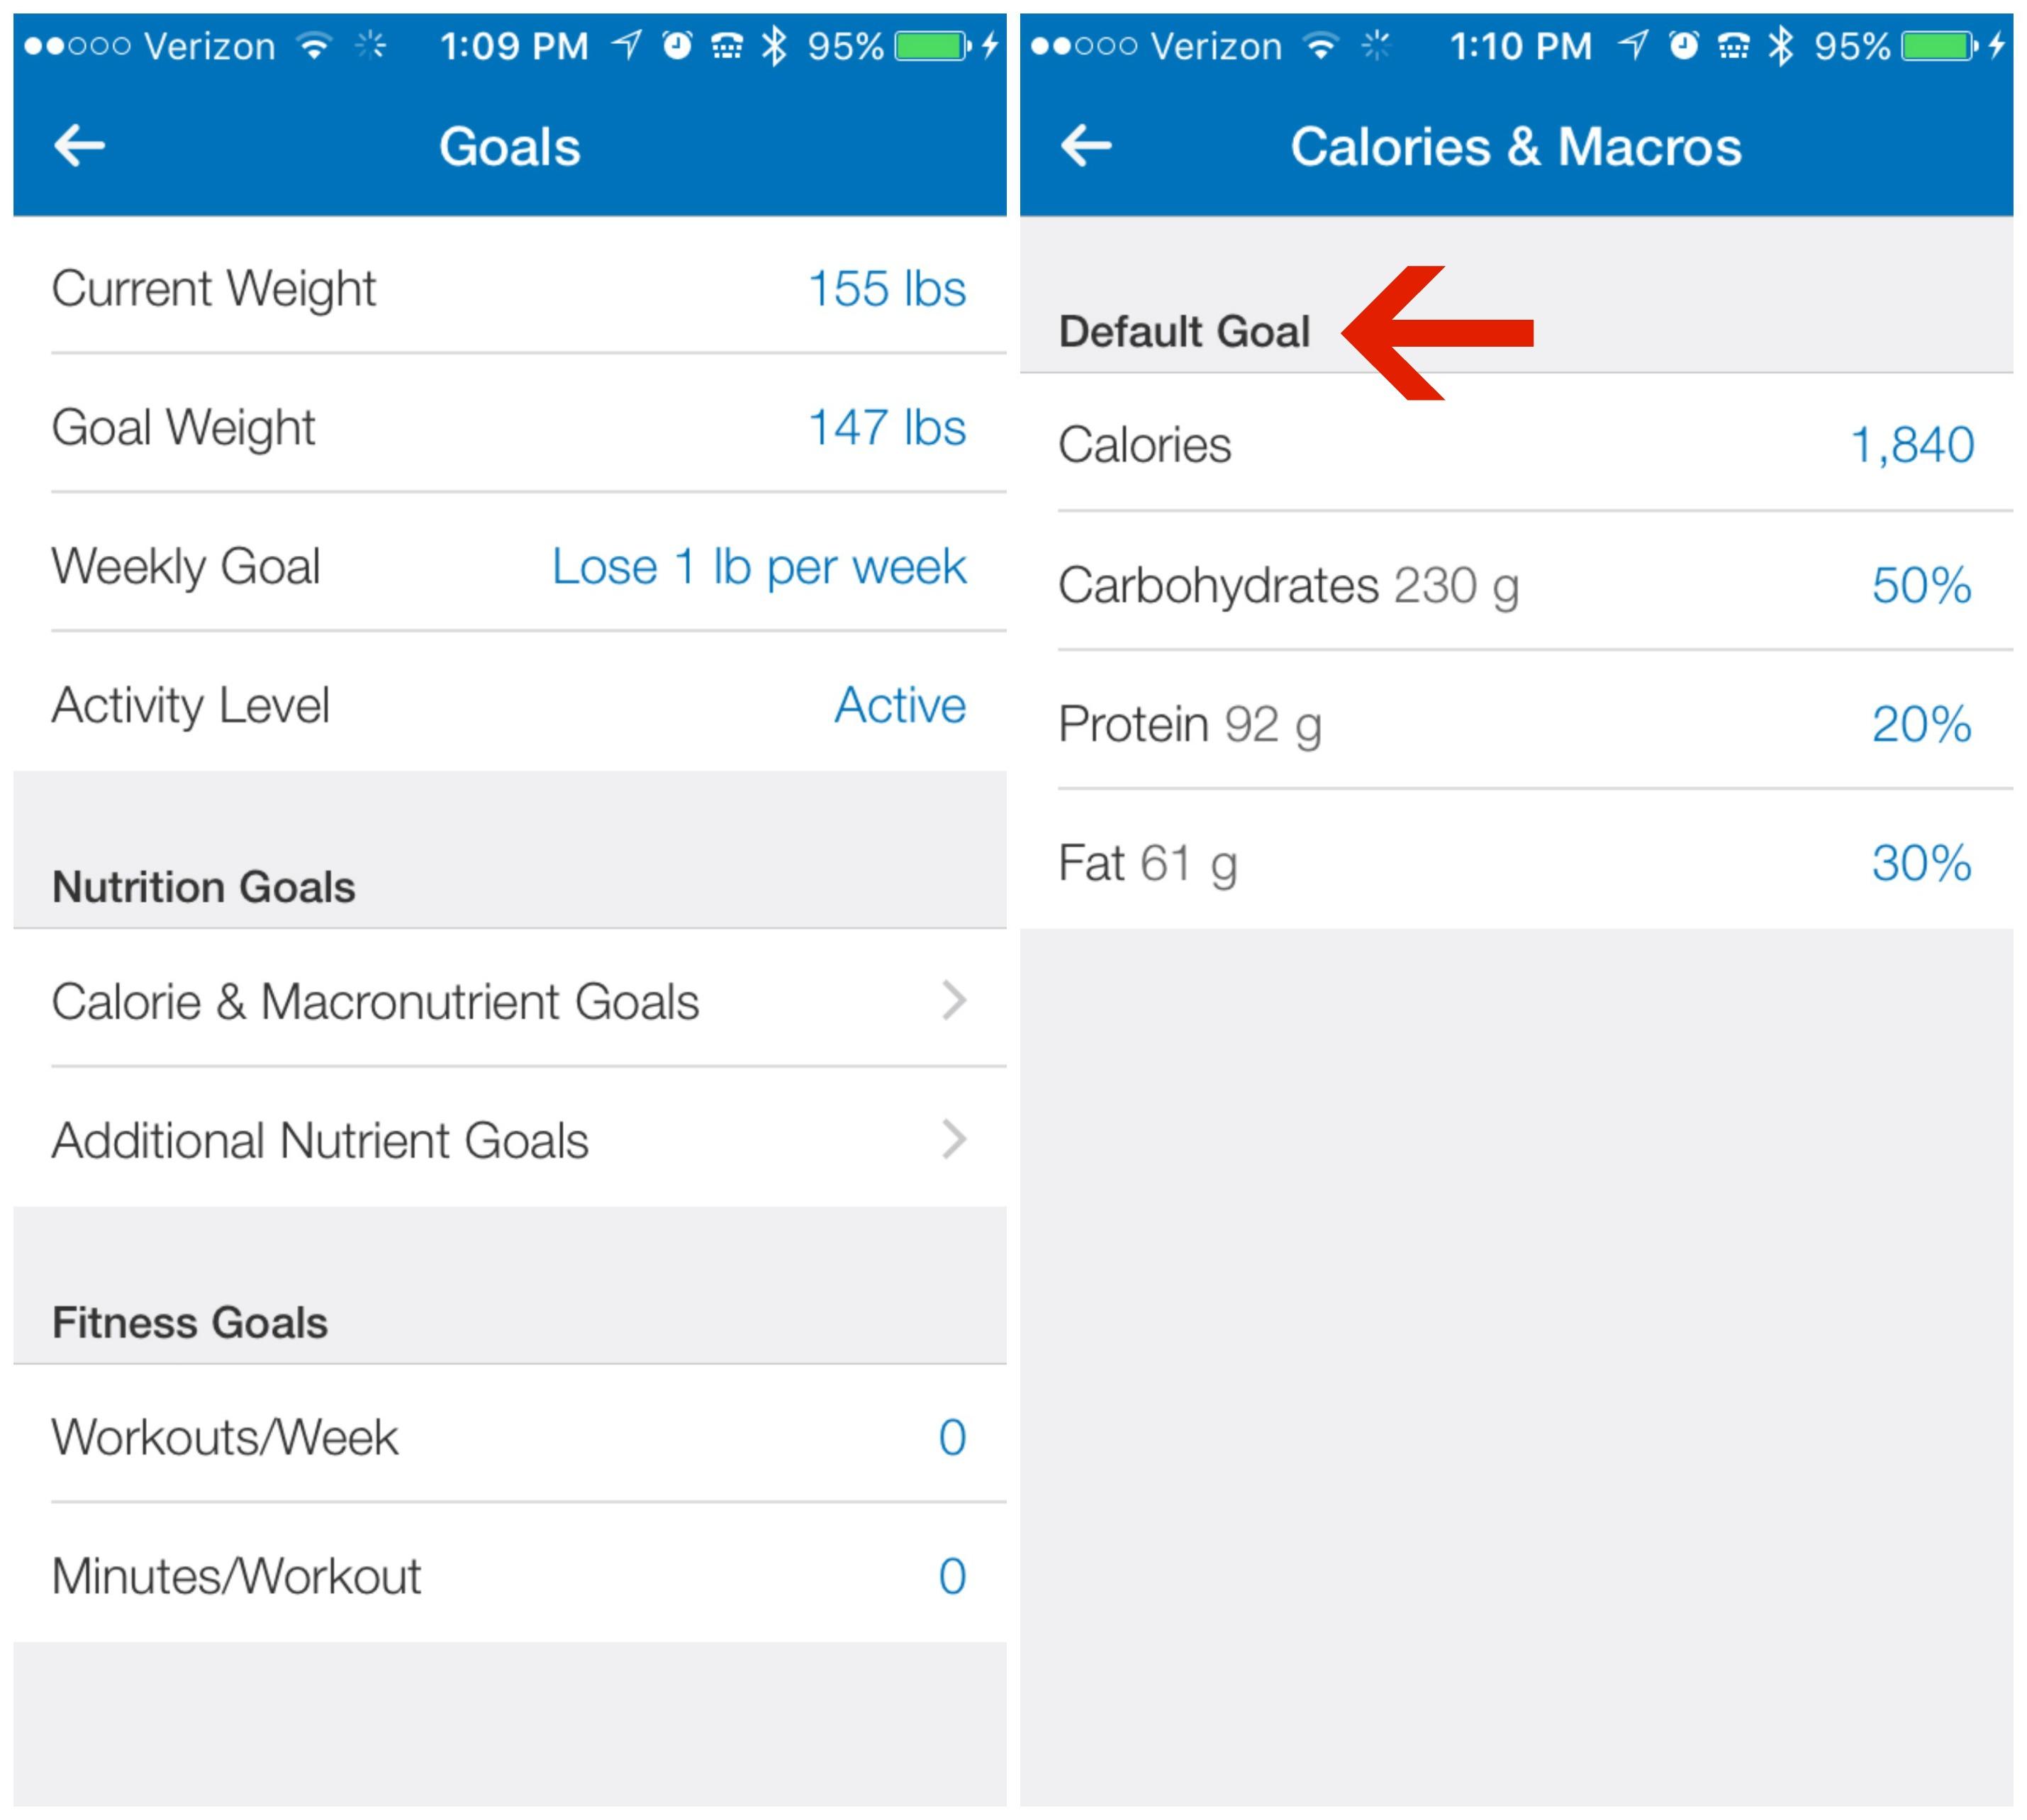 9.3 Goals to Cals and Macros